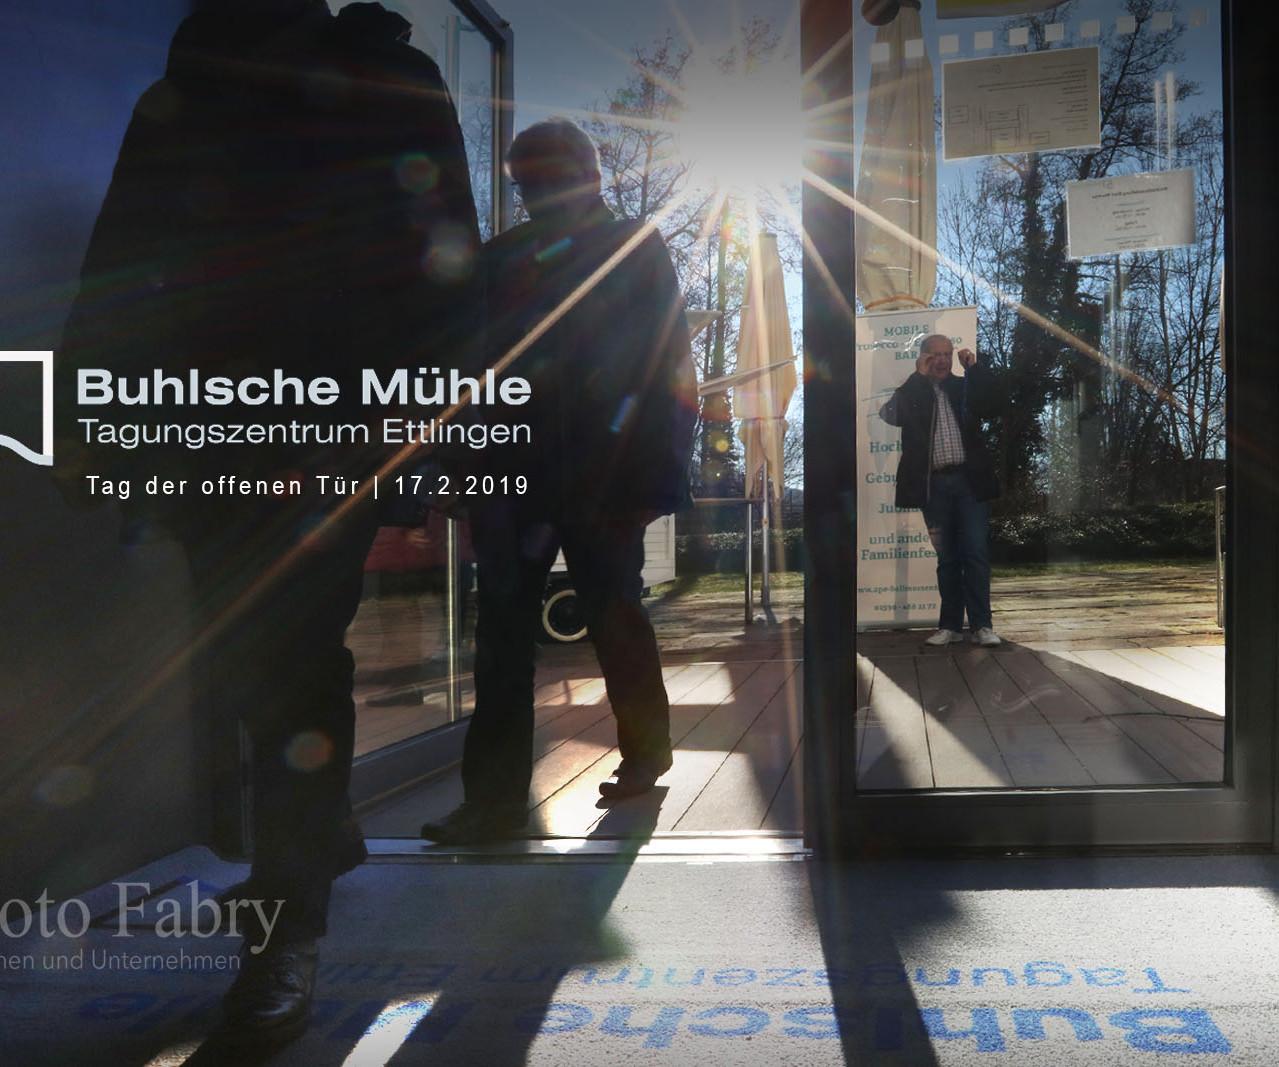 20190217_BuhlscheMühle_FB4